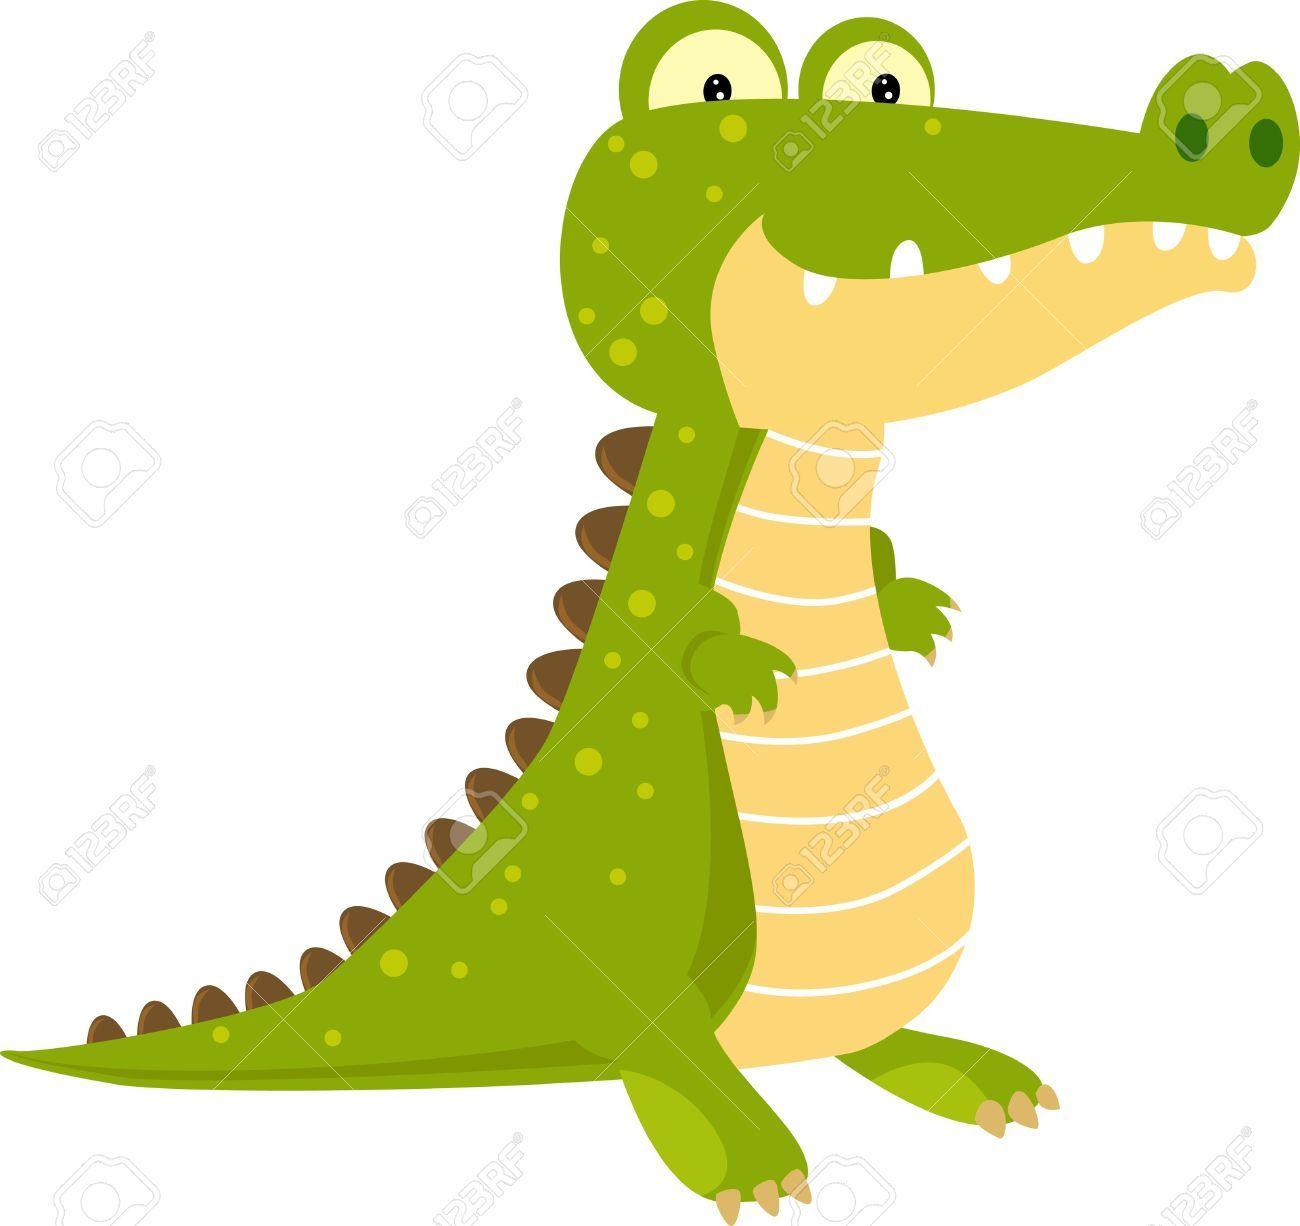 cute crocodile illustration - Google Search | Illustration ...